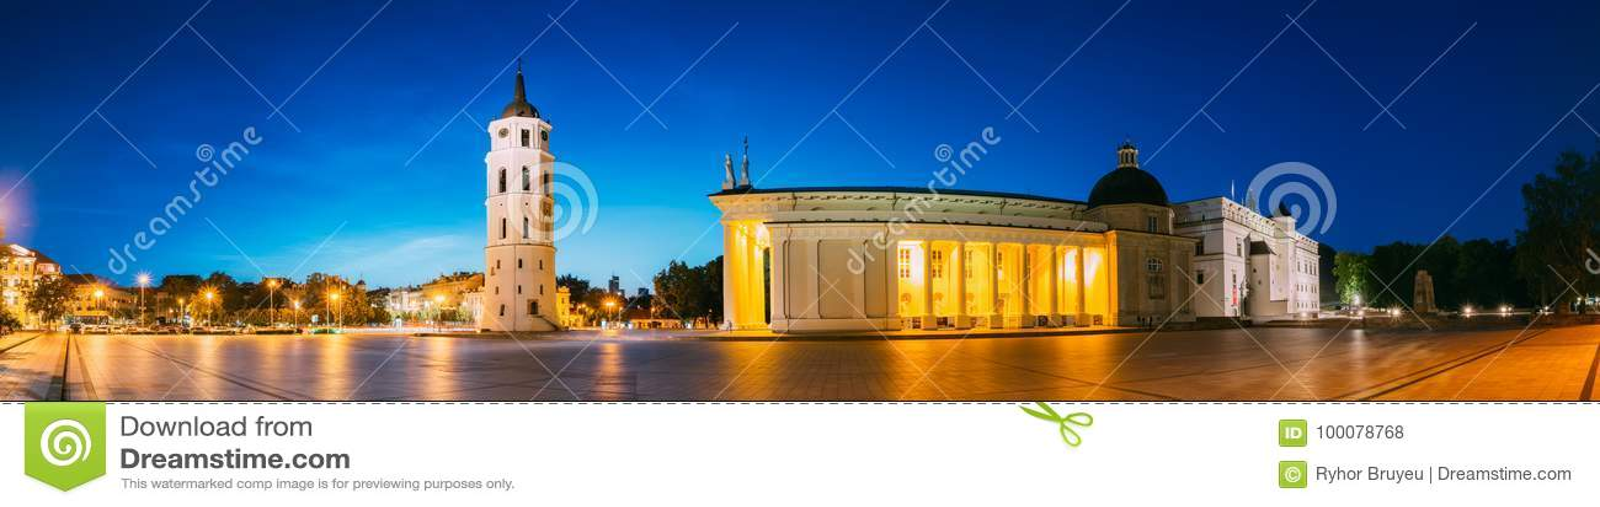 Vilnius, Lituânia, Europa Oriental Panorama da noite da noite da torre de sino da torre de Bell, basílica da catedral de St Stani